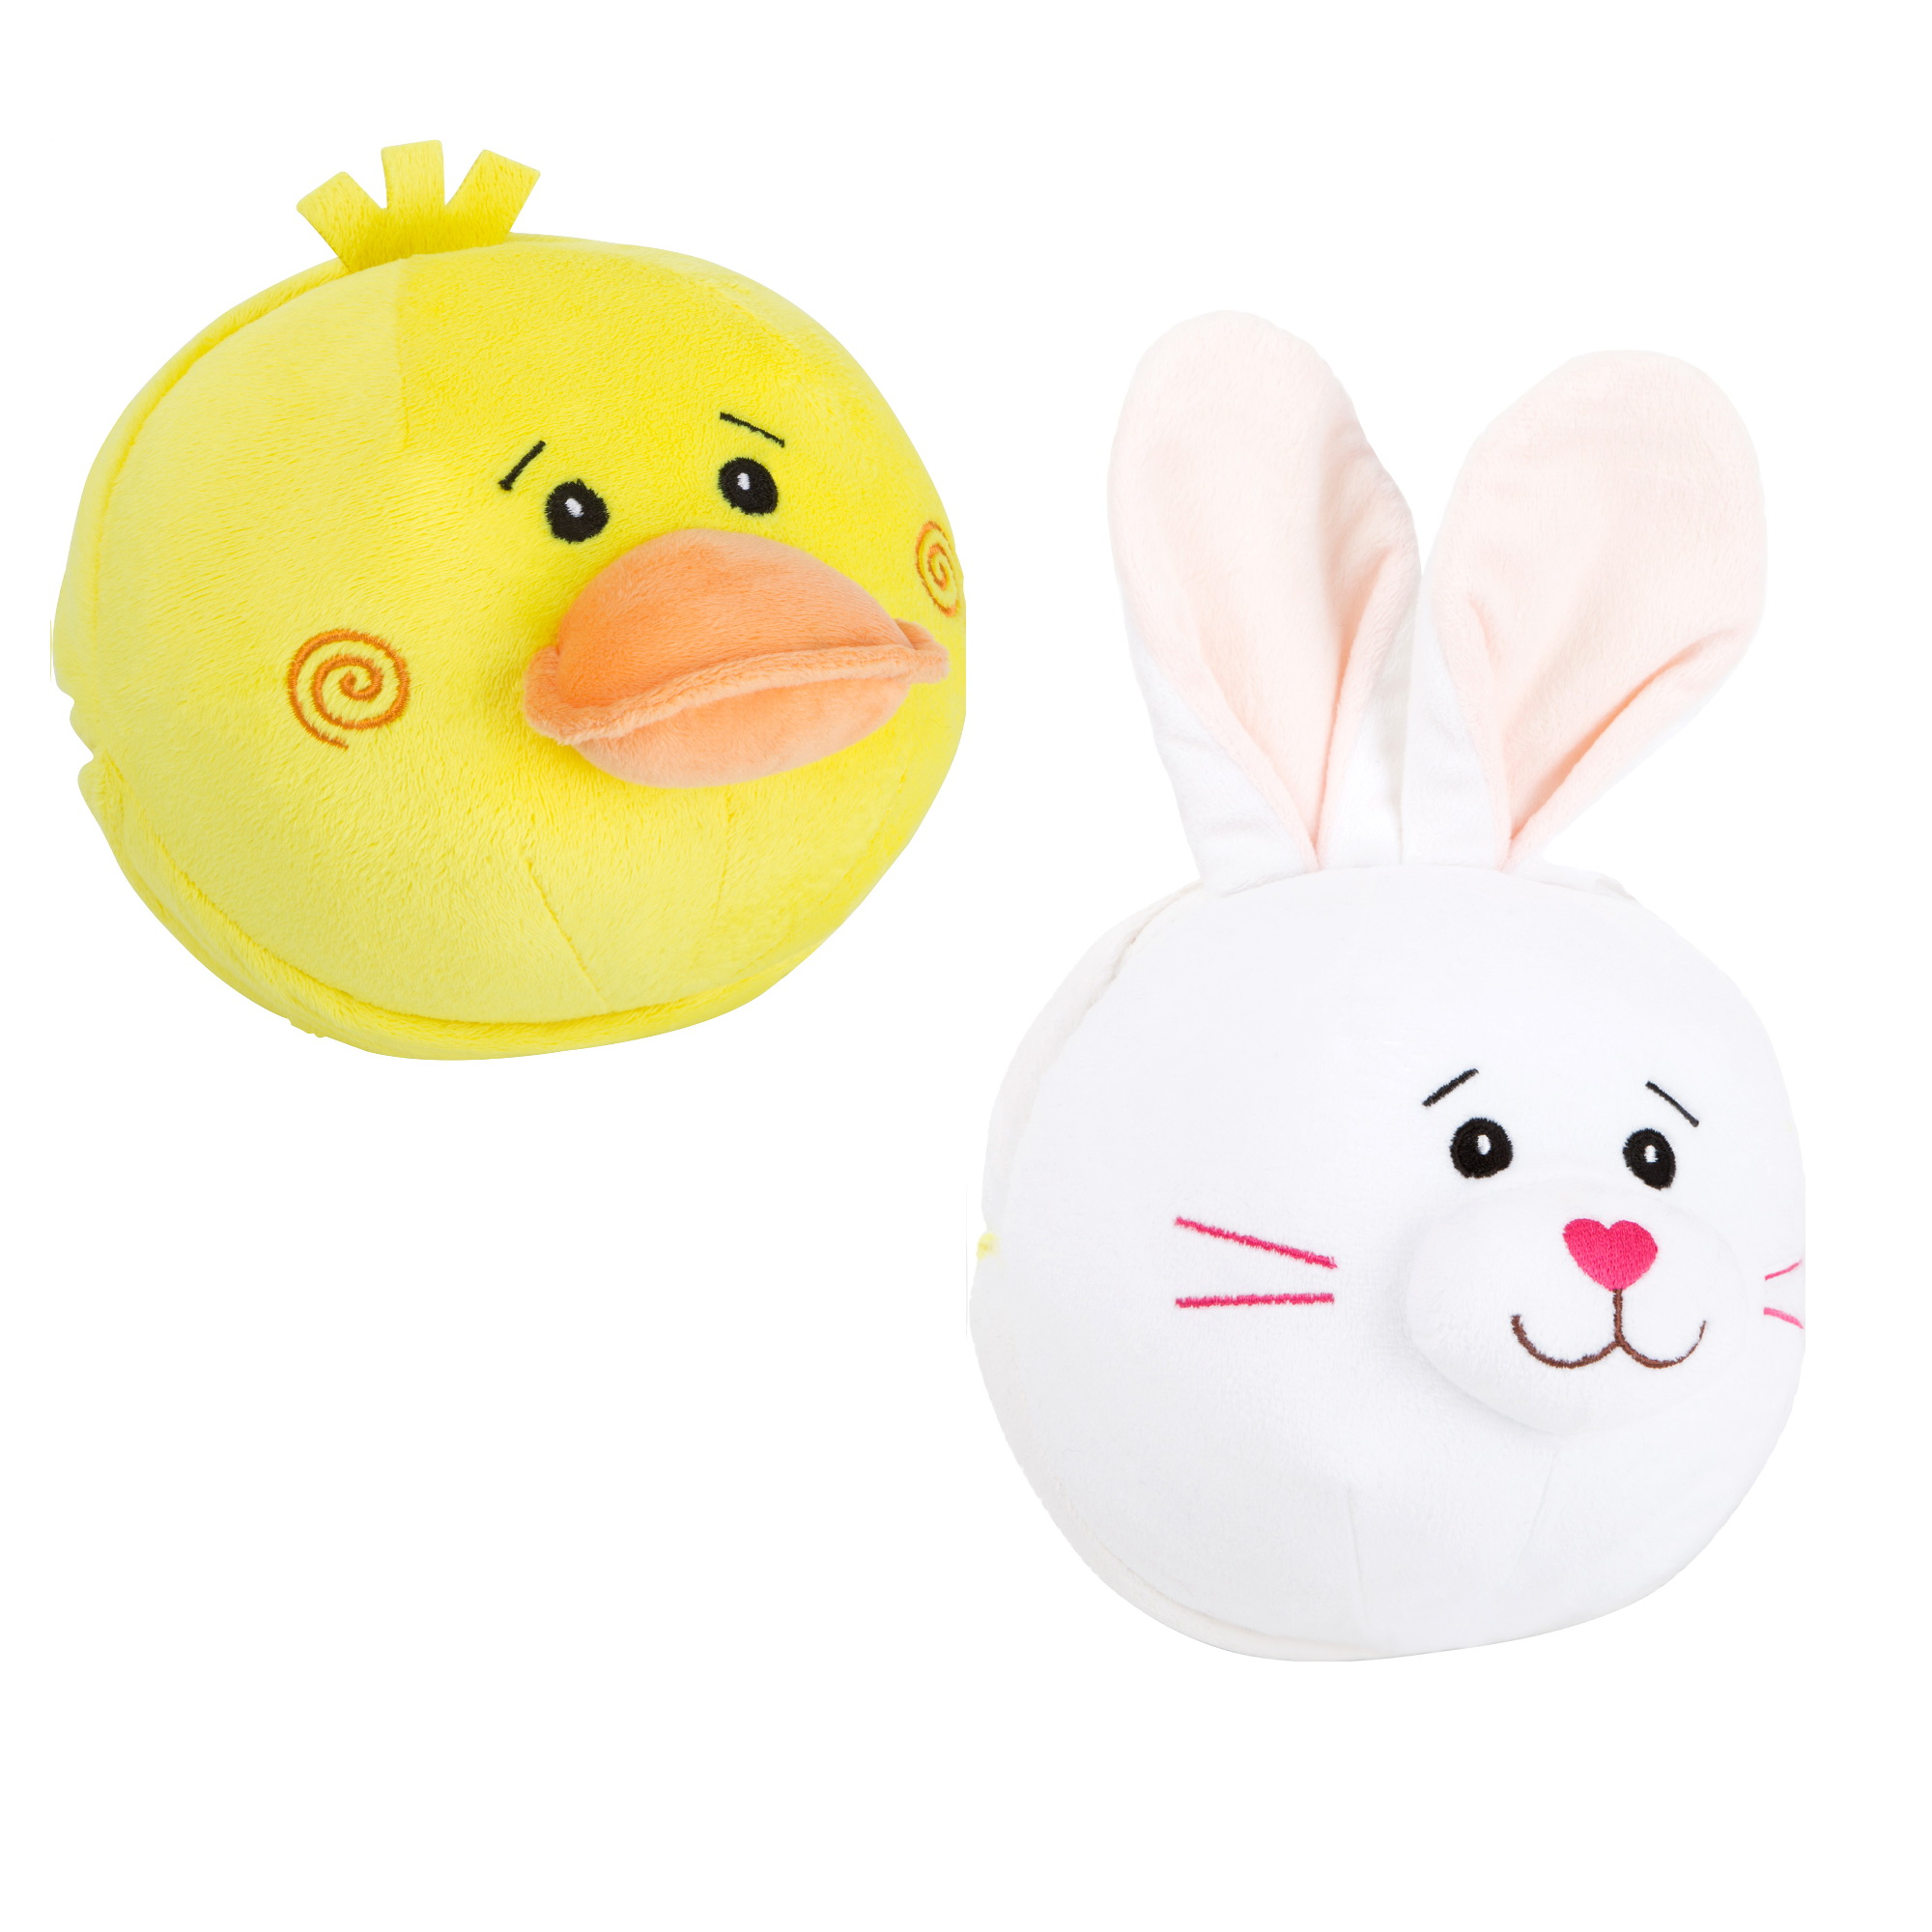 Žoga zajček račka 2 v 1